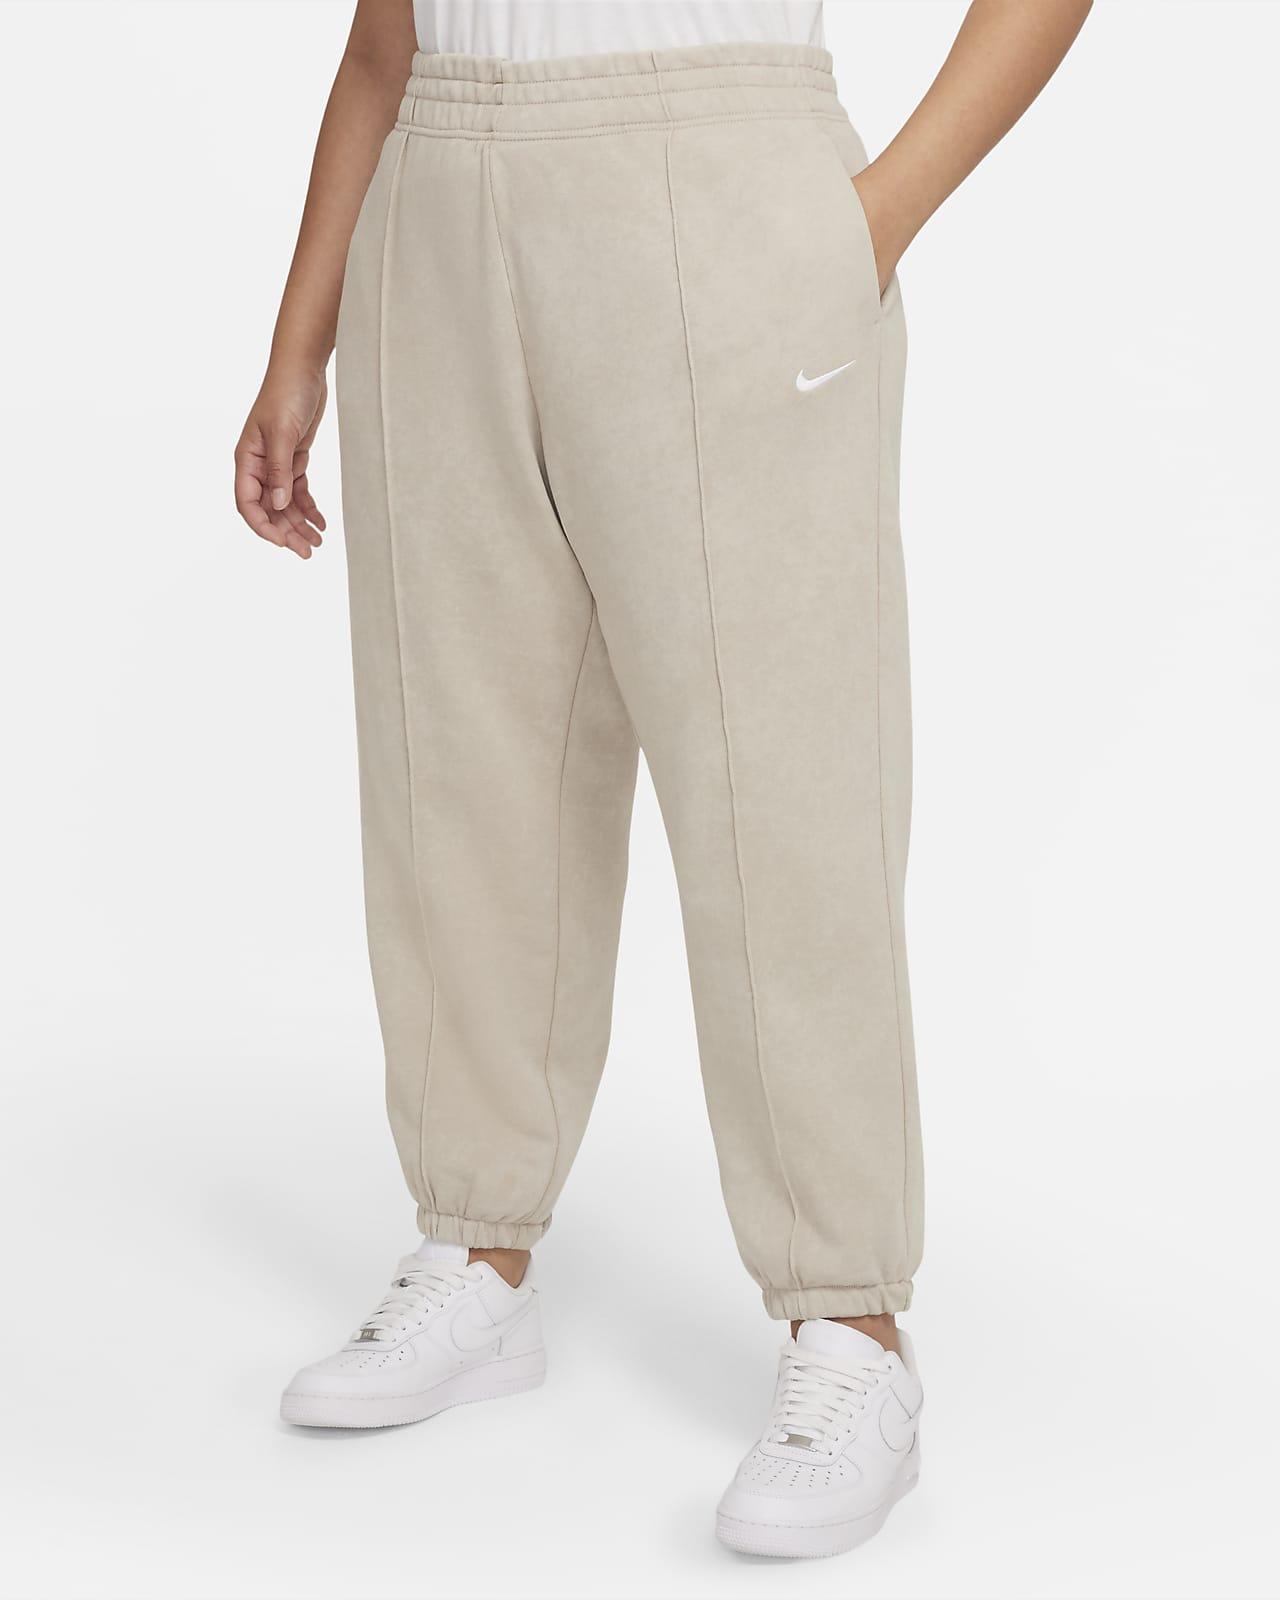 Nike Sportswear Essential Collection Women's Washed Fleece Trousers (Plus Size)